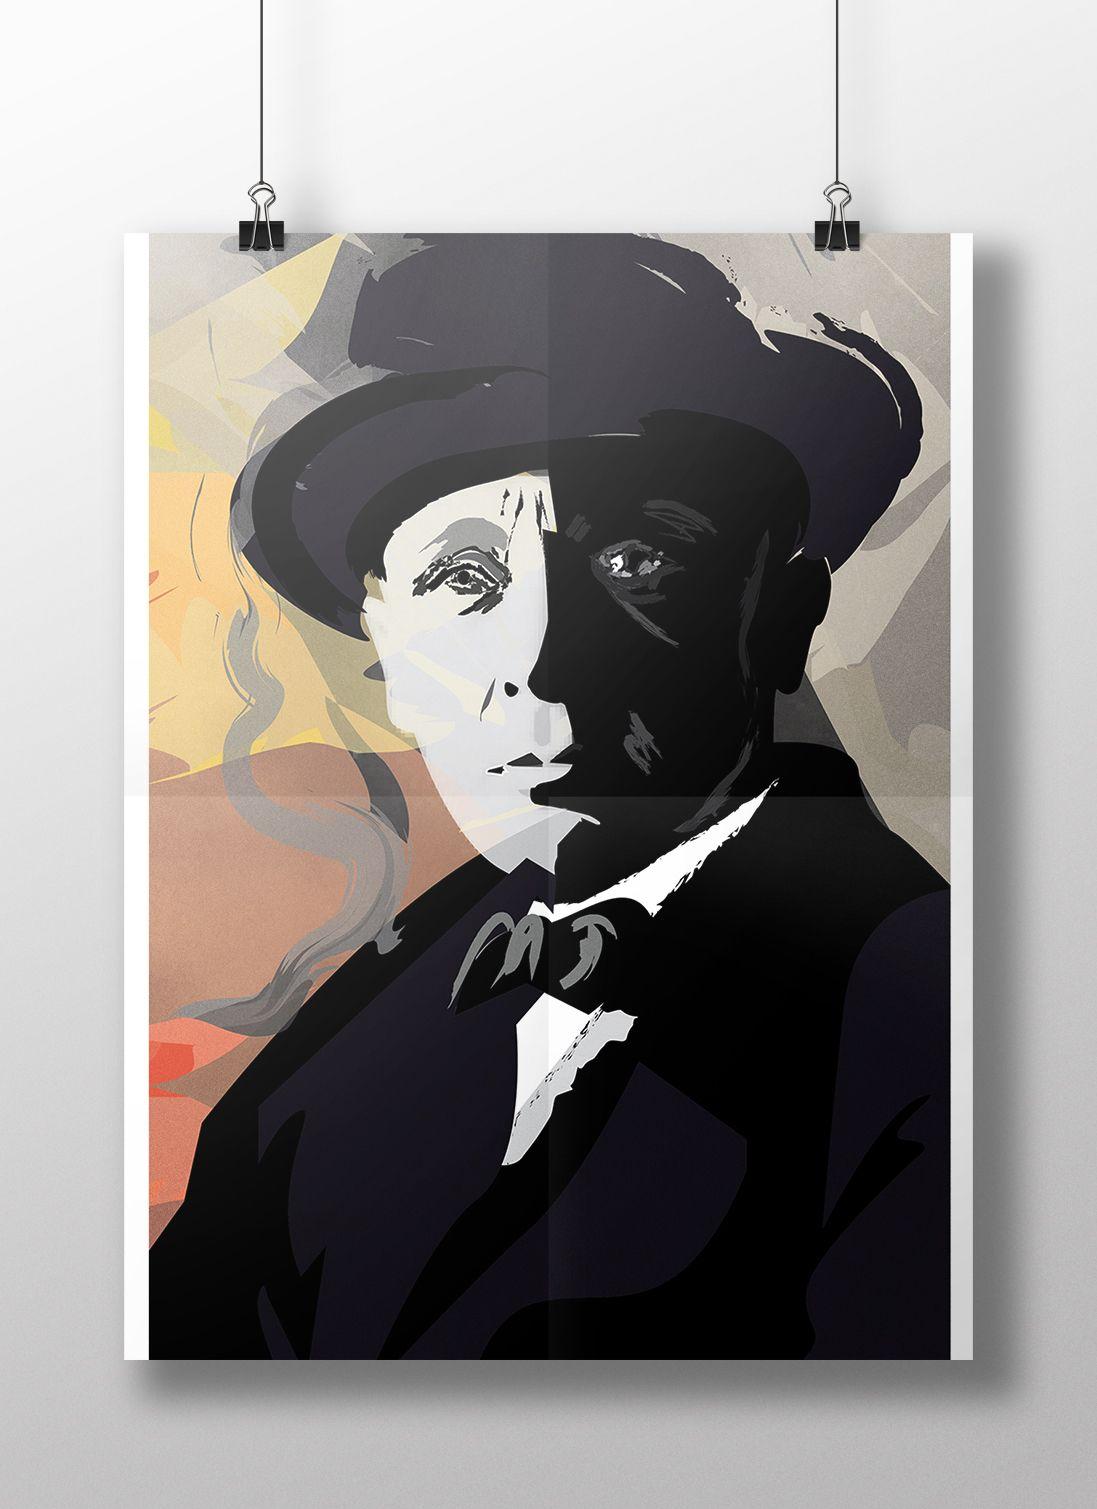 Плакат-портрет Михаила Булгакова - дизайнер luveya